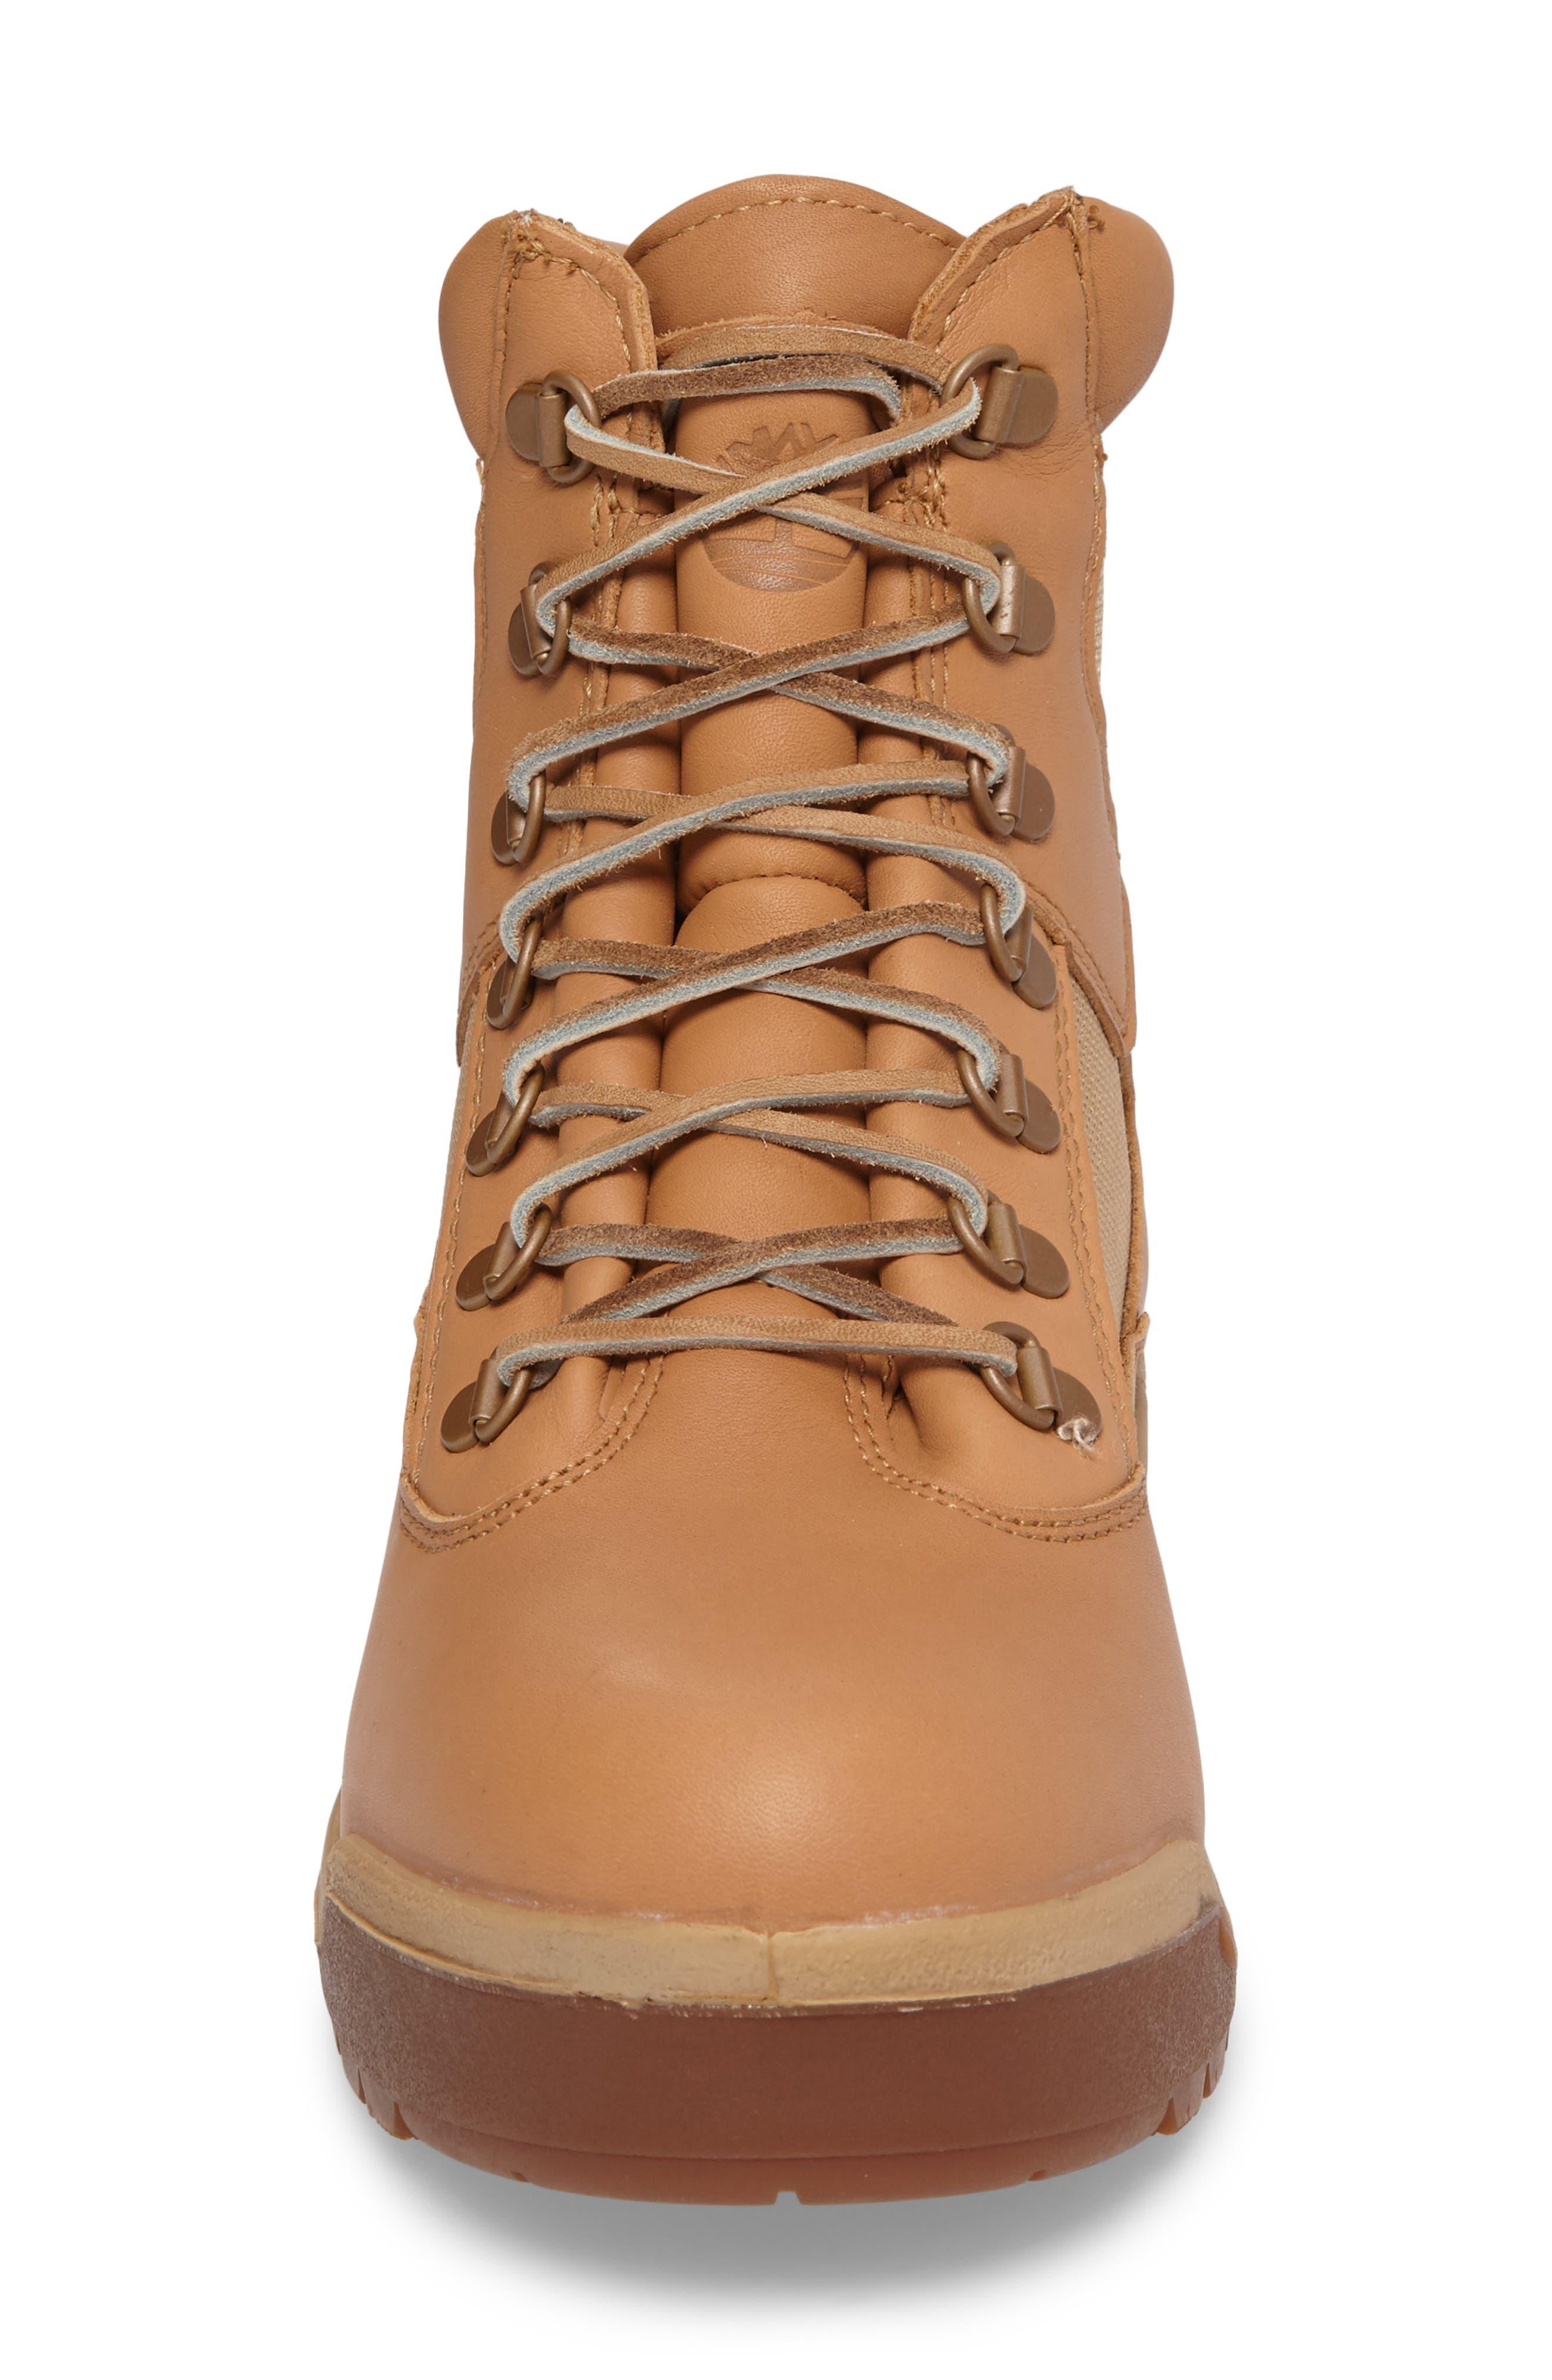 Waterproof Boot,                             Alternate thumbnail 4, color,                             Natural Hoween/ Latigo Leather